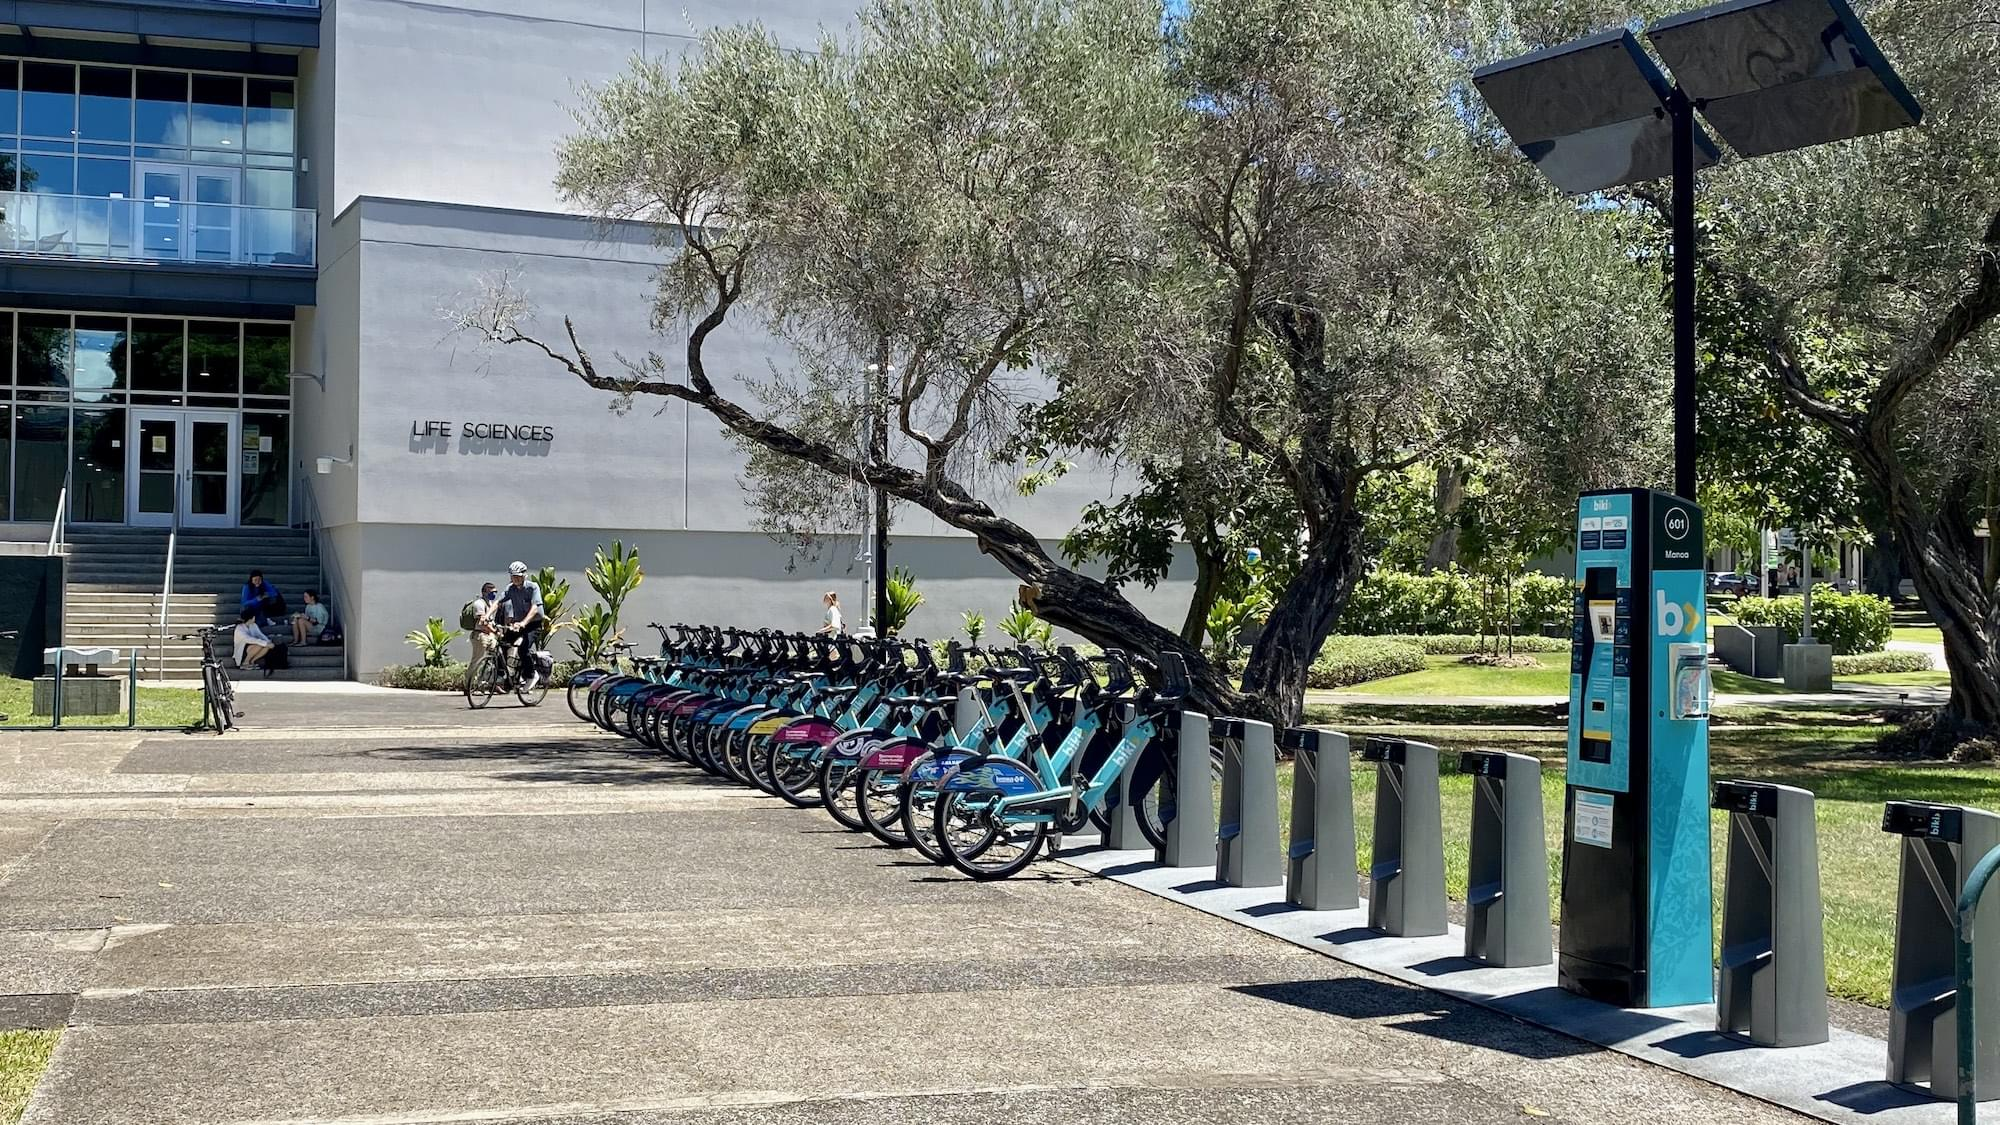 Biki bikes at stop between Hamilton Library and Life Sciences Bldg.